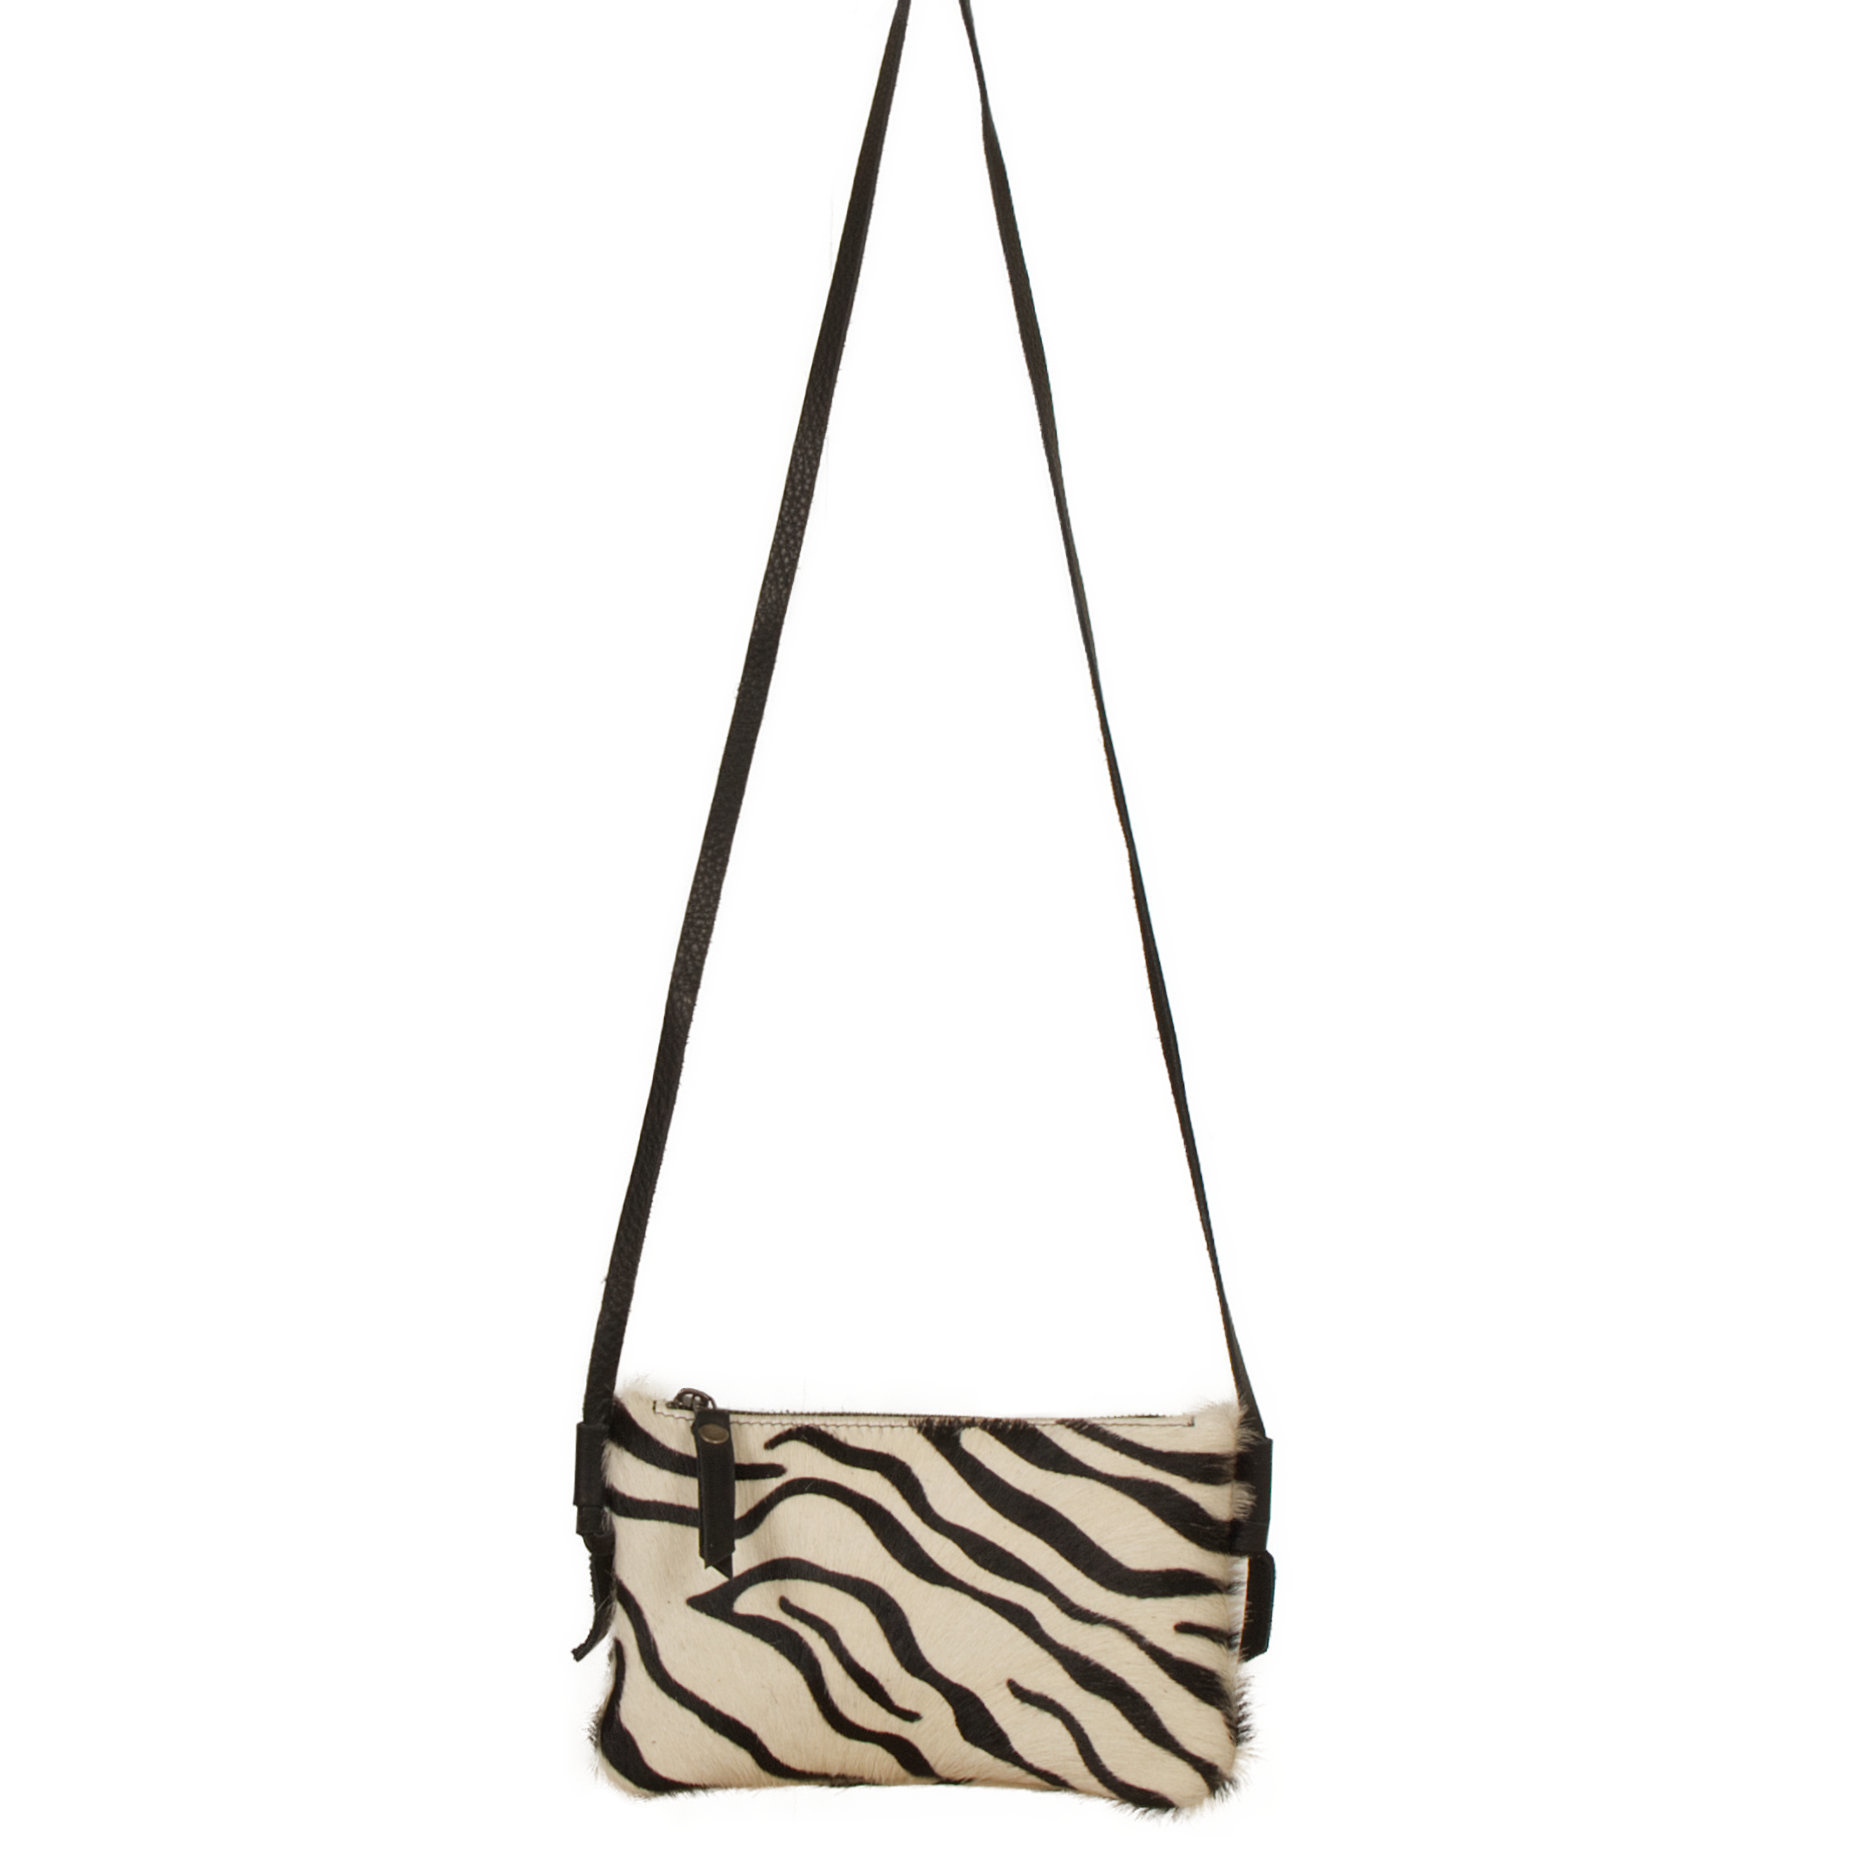 testVan Buren Koeienhuid schoudertasje - Zebraprint | Lederen crossbody